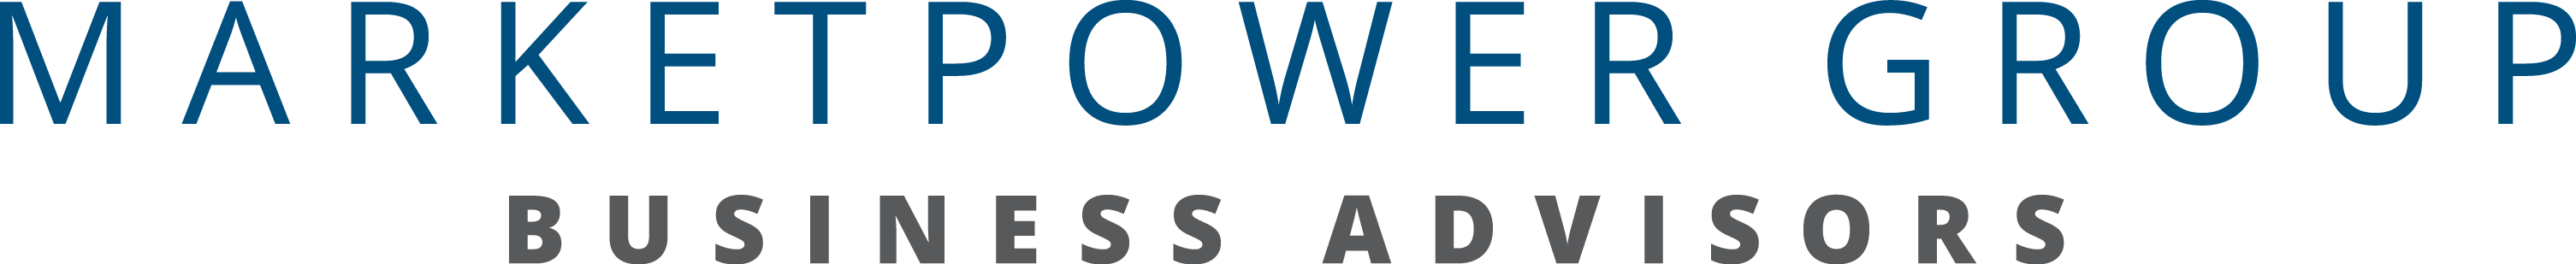 MarketPower Group